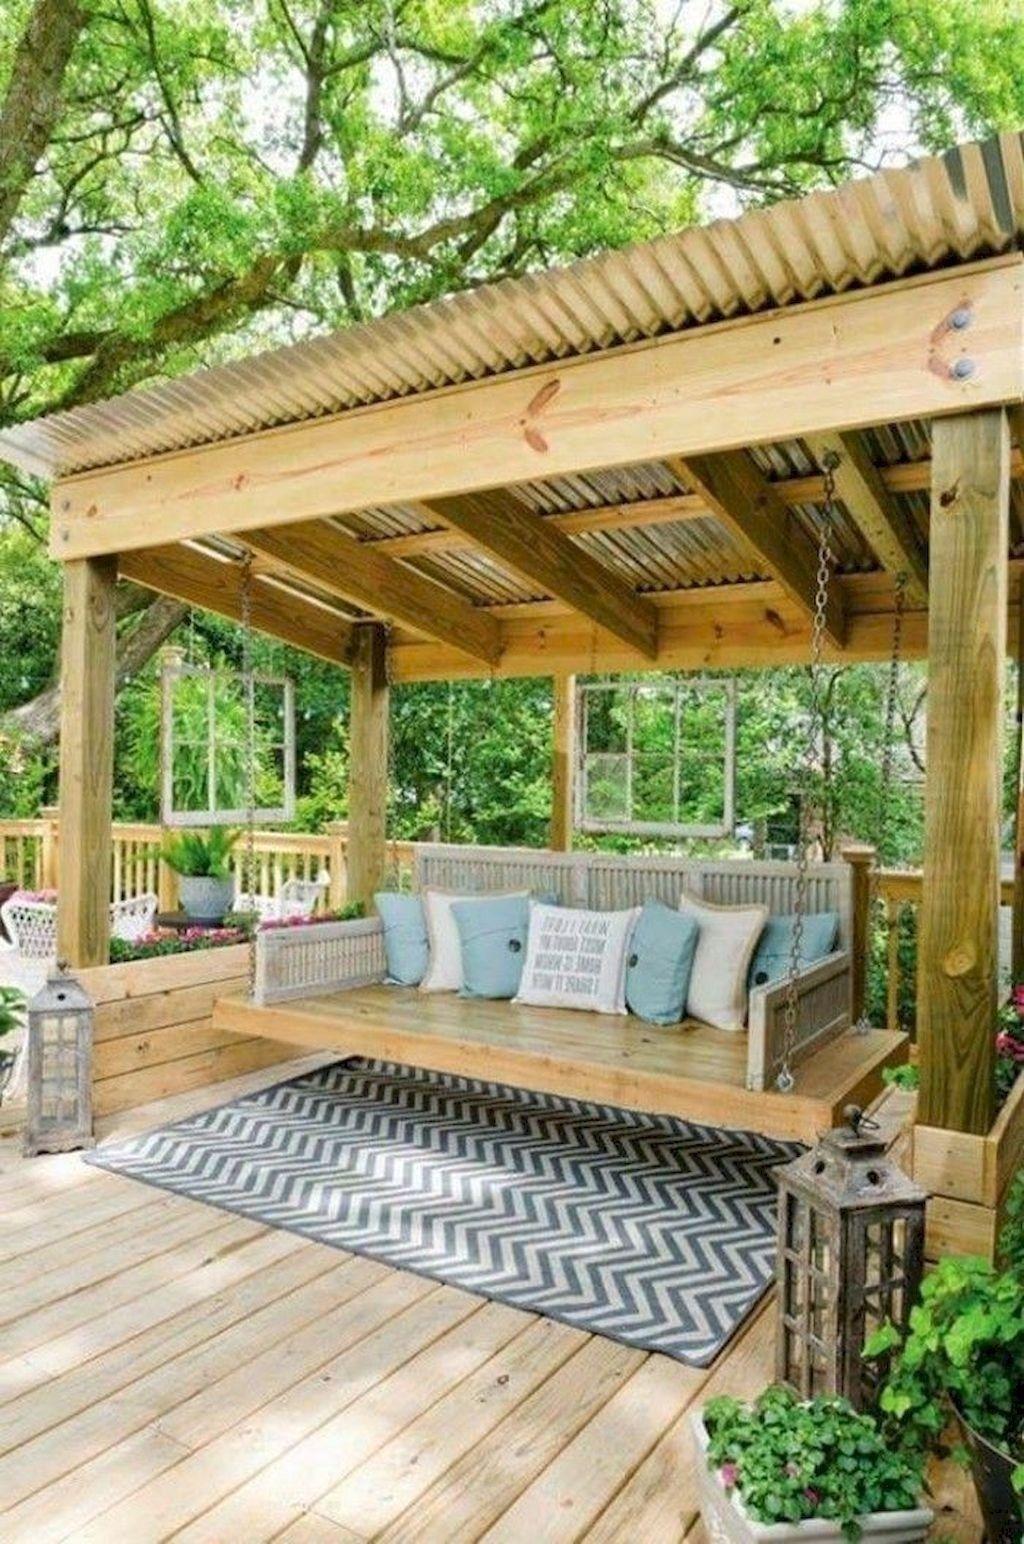 39 EXCITING DIY BACKYARD GAZEBO DESIGN IDEAS | Backyard ...